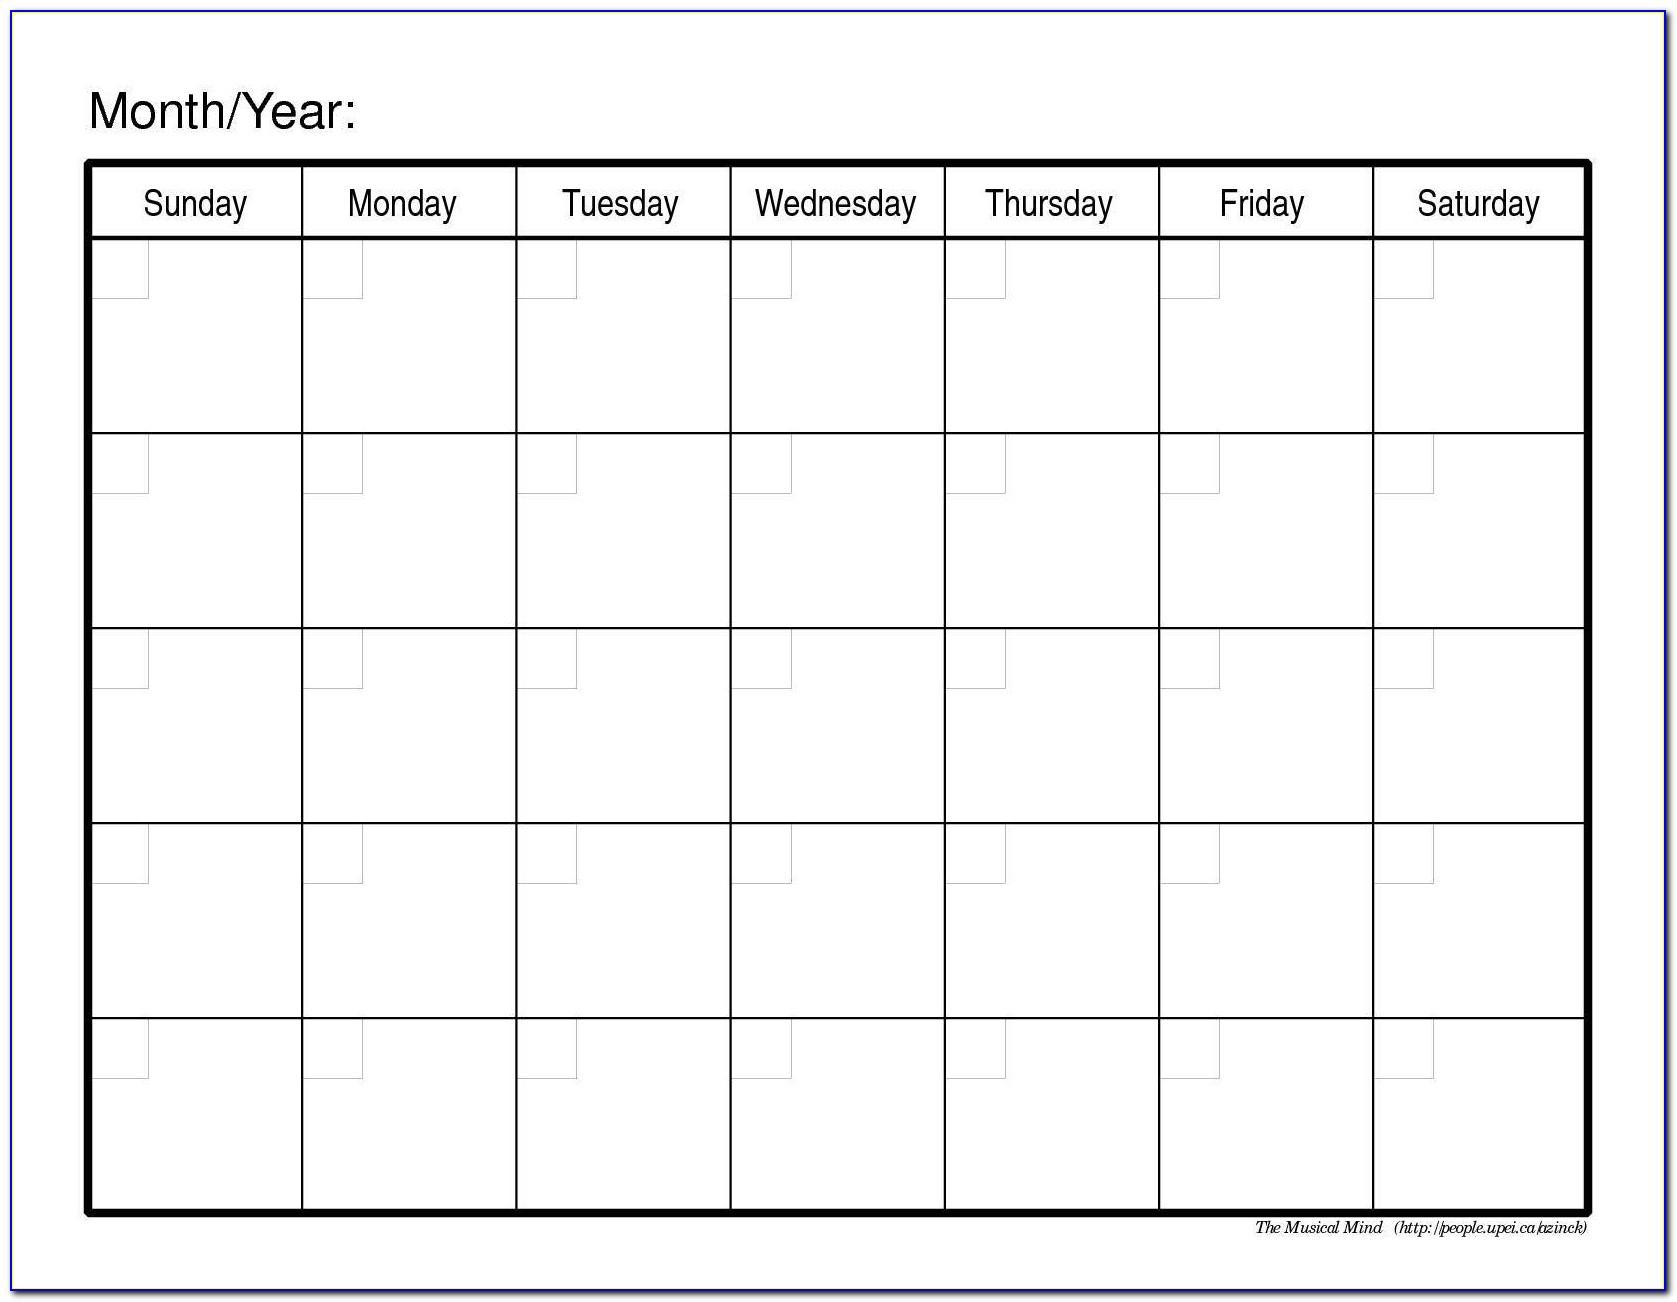 Monthly Agenda Calendar Template